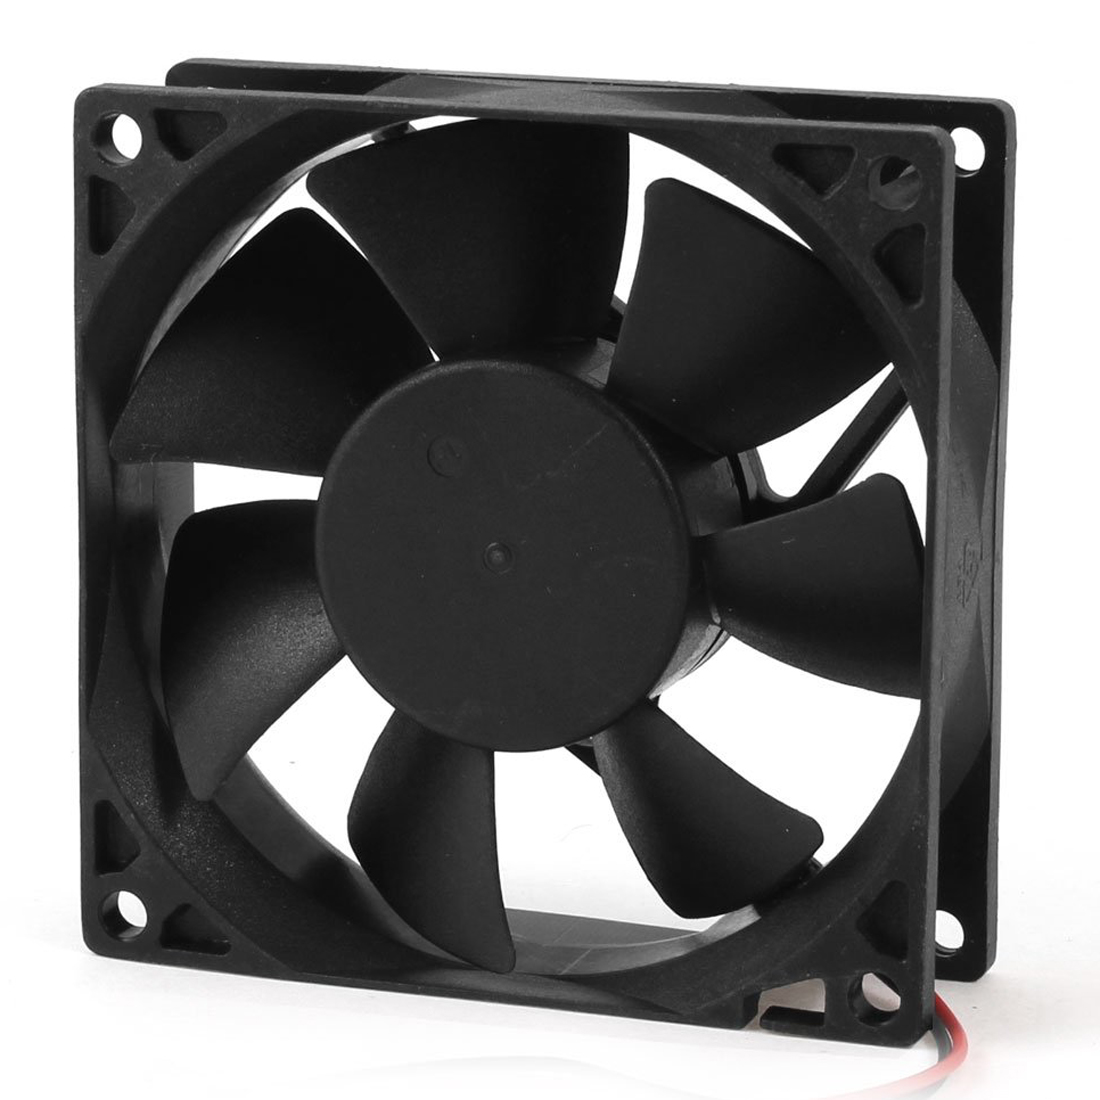 80mm DC 12V 2pin PC Computer Desktop Case CPU Cooler Cooling Fan